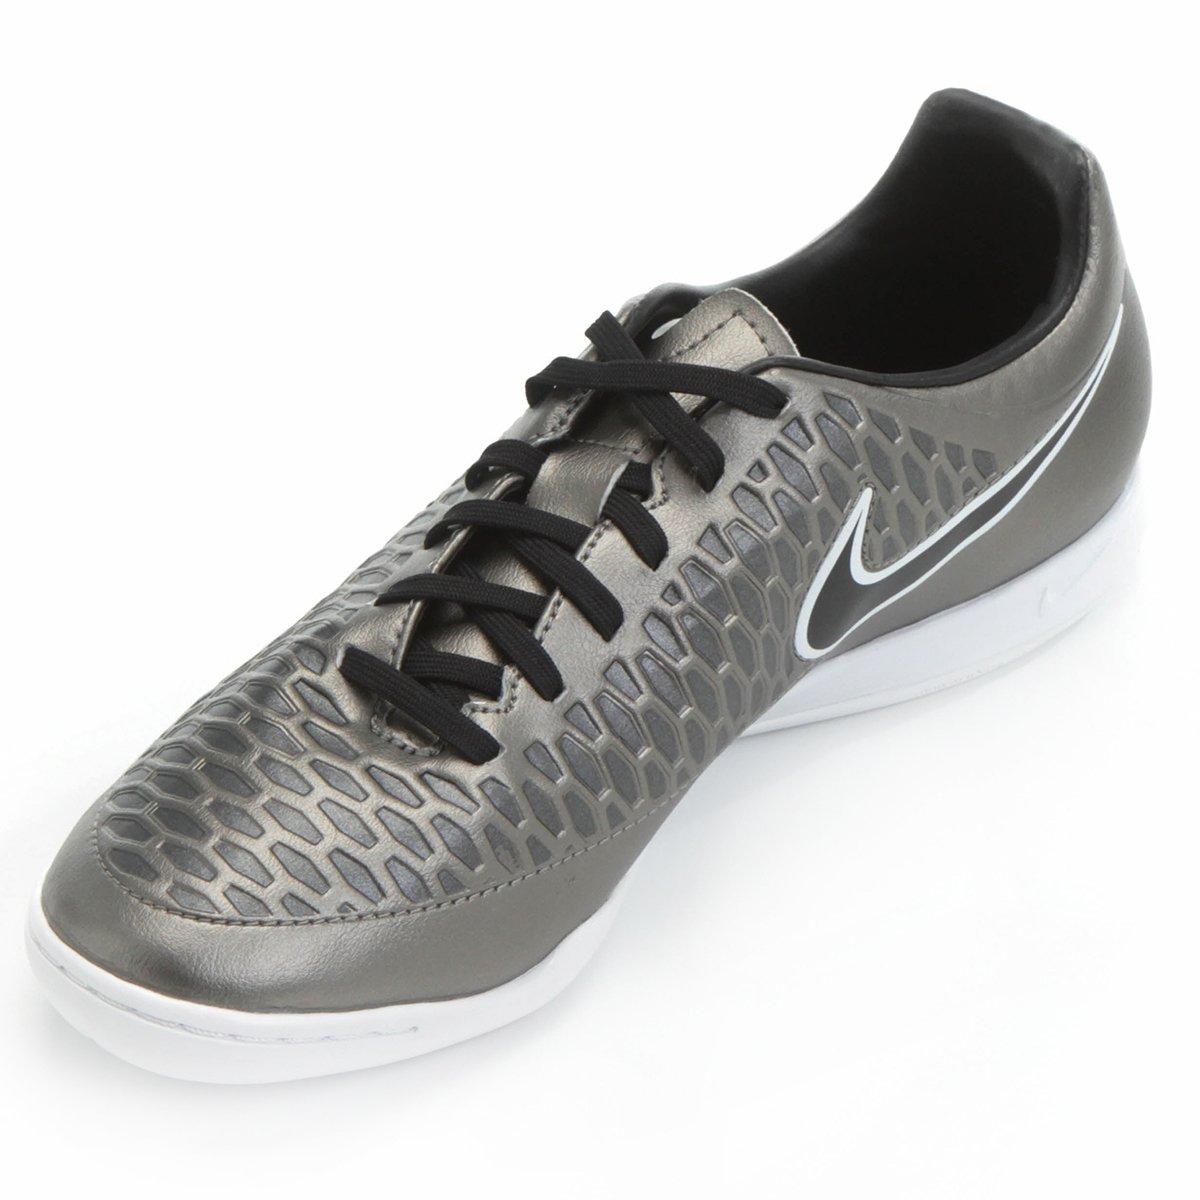 0d6f493d6c Chuteira Nike Magista Onda IC Futsal - Compre Agora